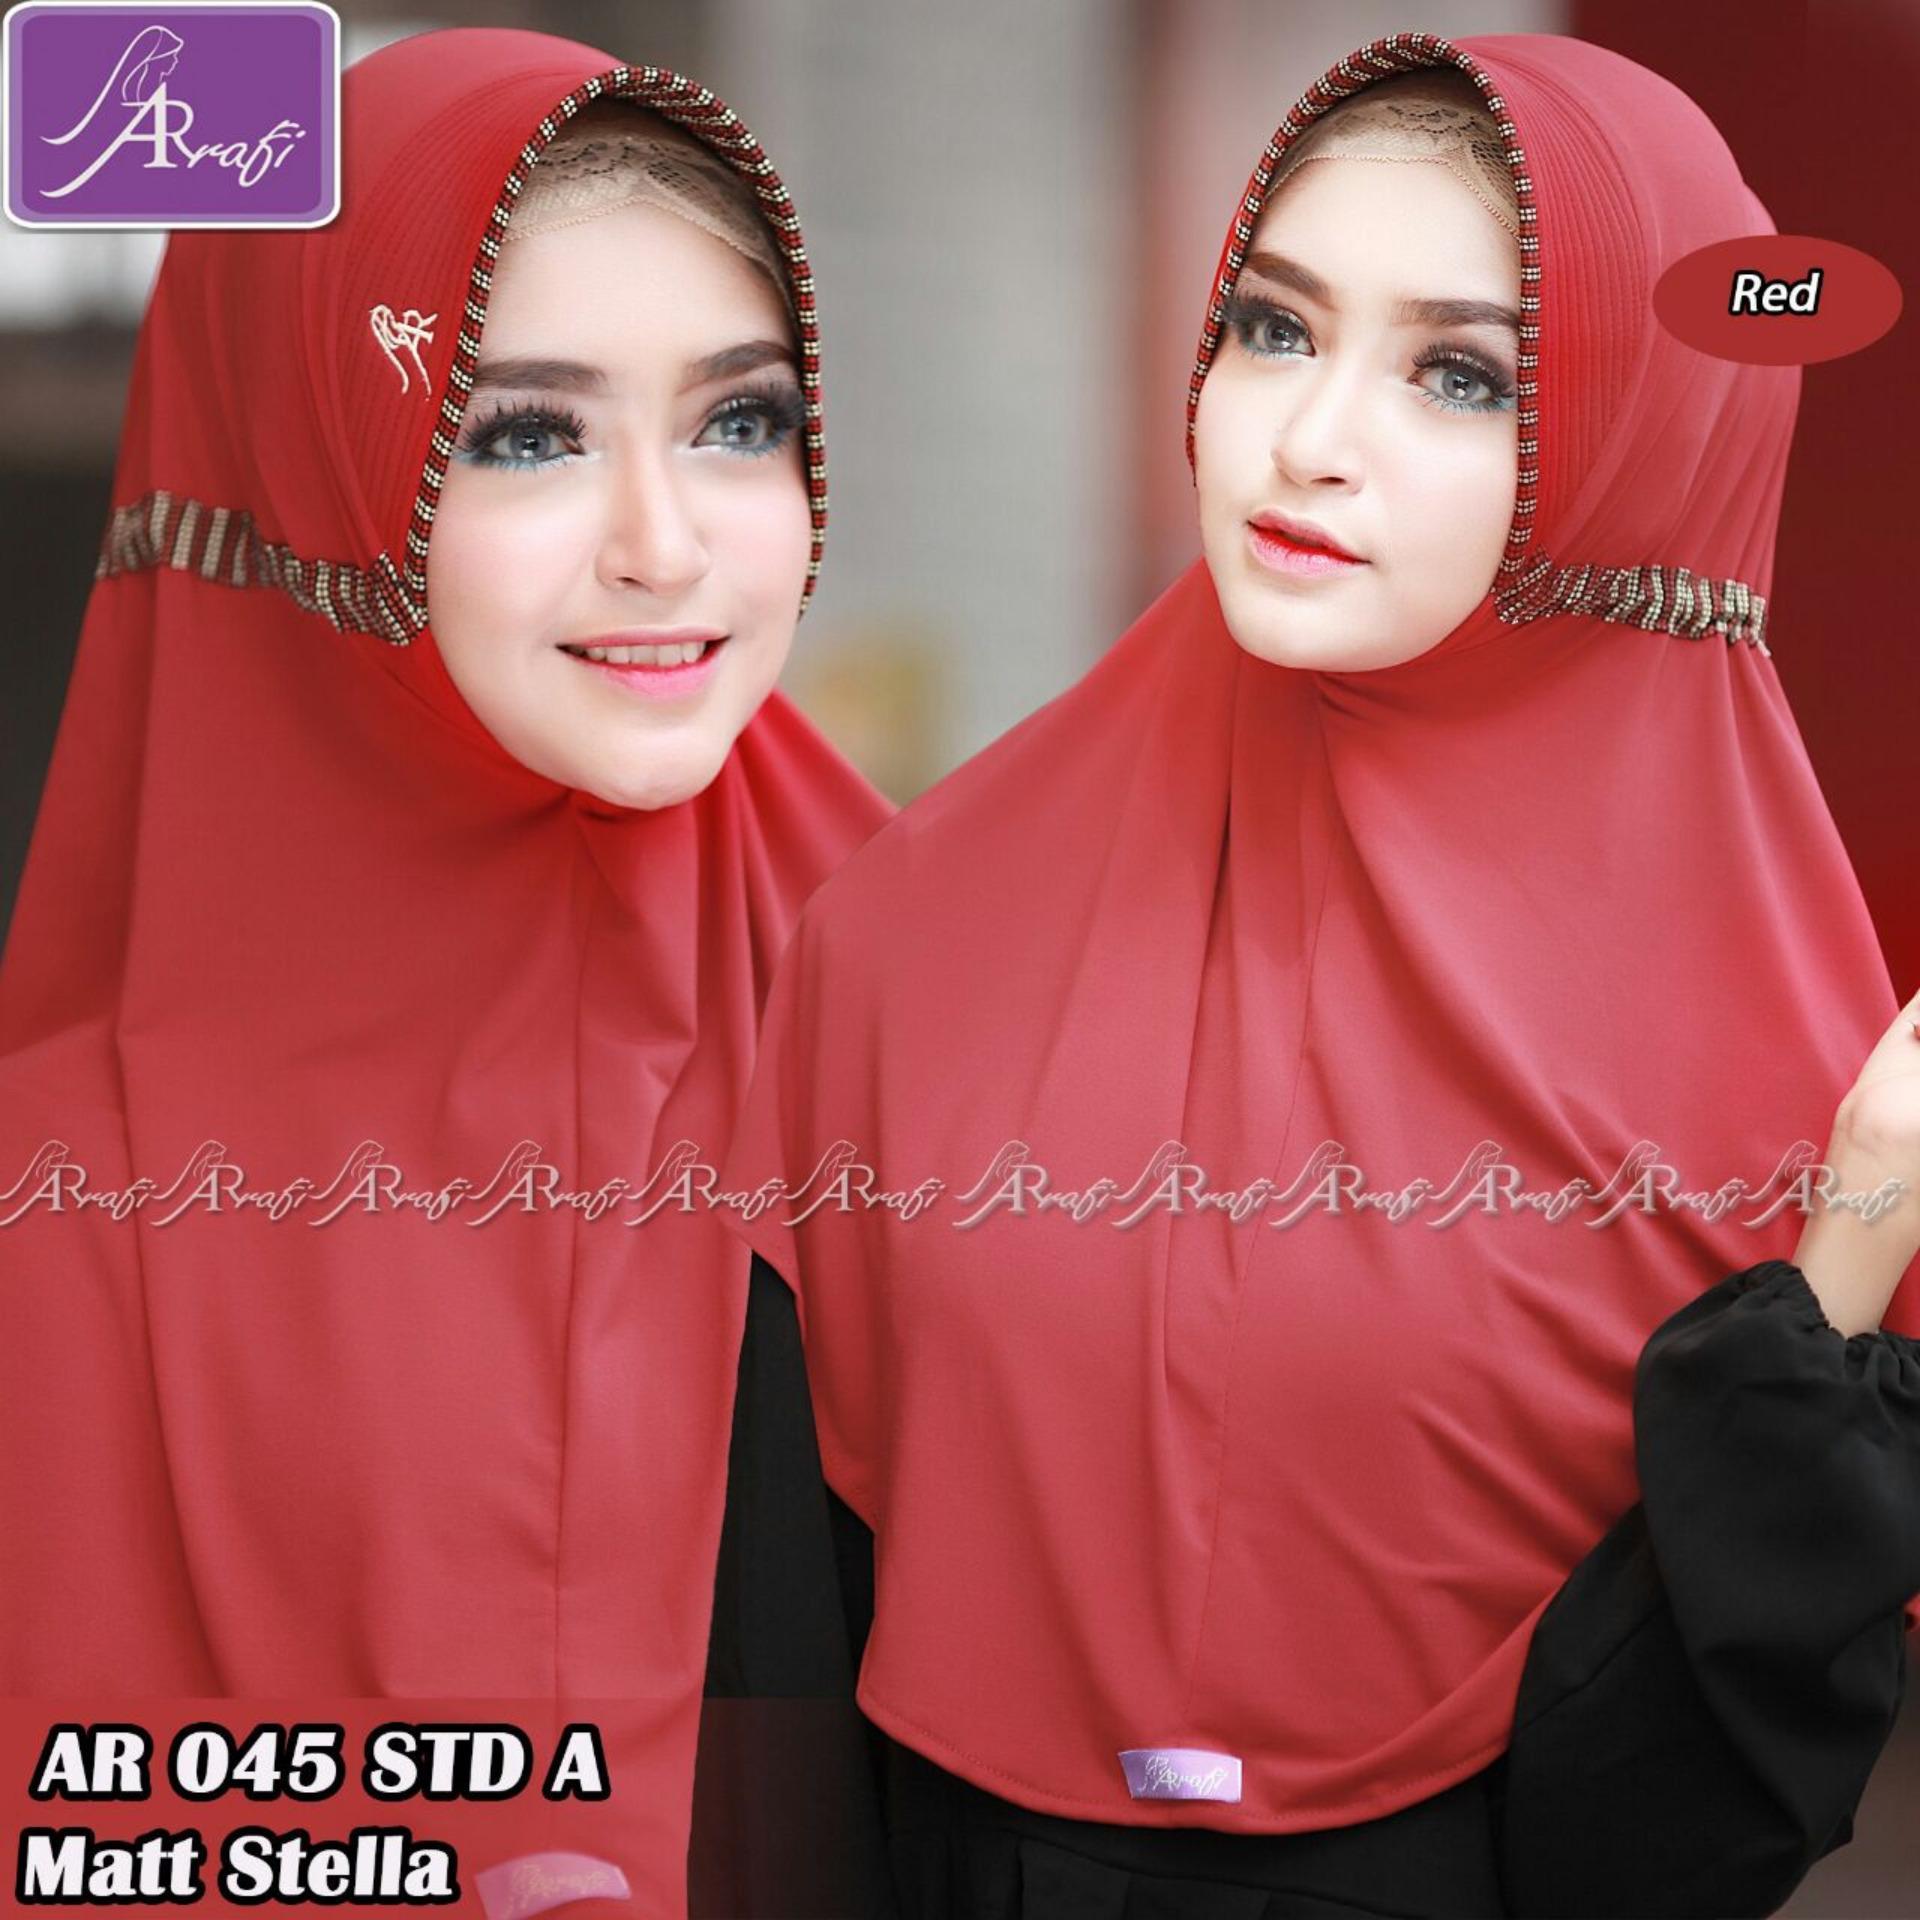 Hijab Instan Arrafi Talita Kombinasi Warna Peach Ar45a Jilbab Violet Best Seller From Brand Kerudung Red Bergo Khimar